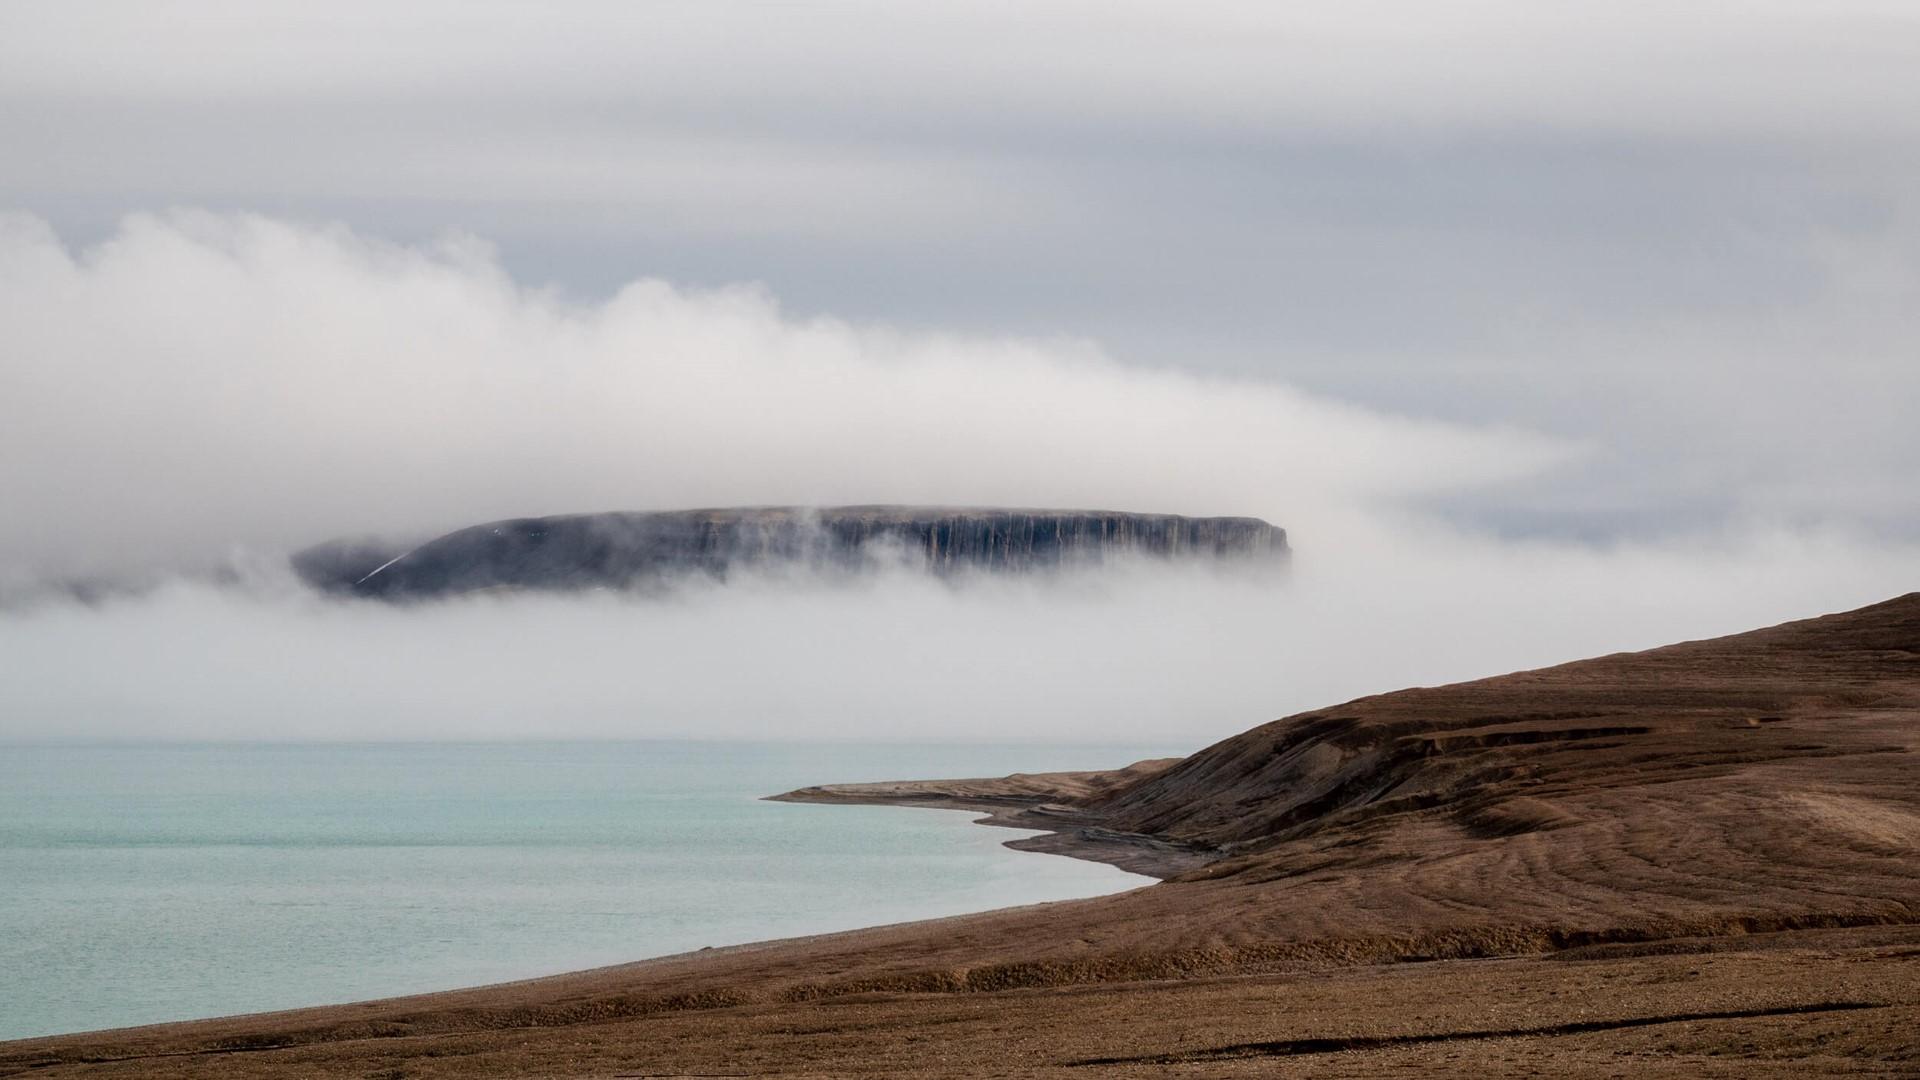 landskap-beechey-island-canada-hgr-139444-foto_camille_seaman_jpg